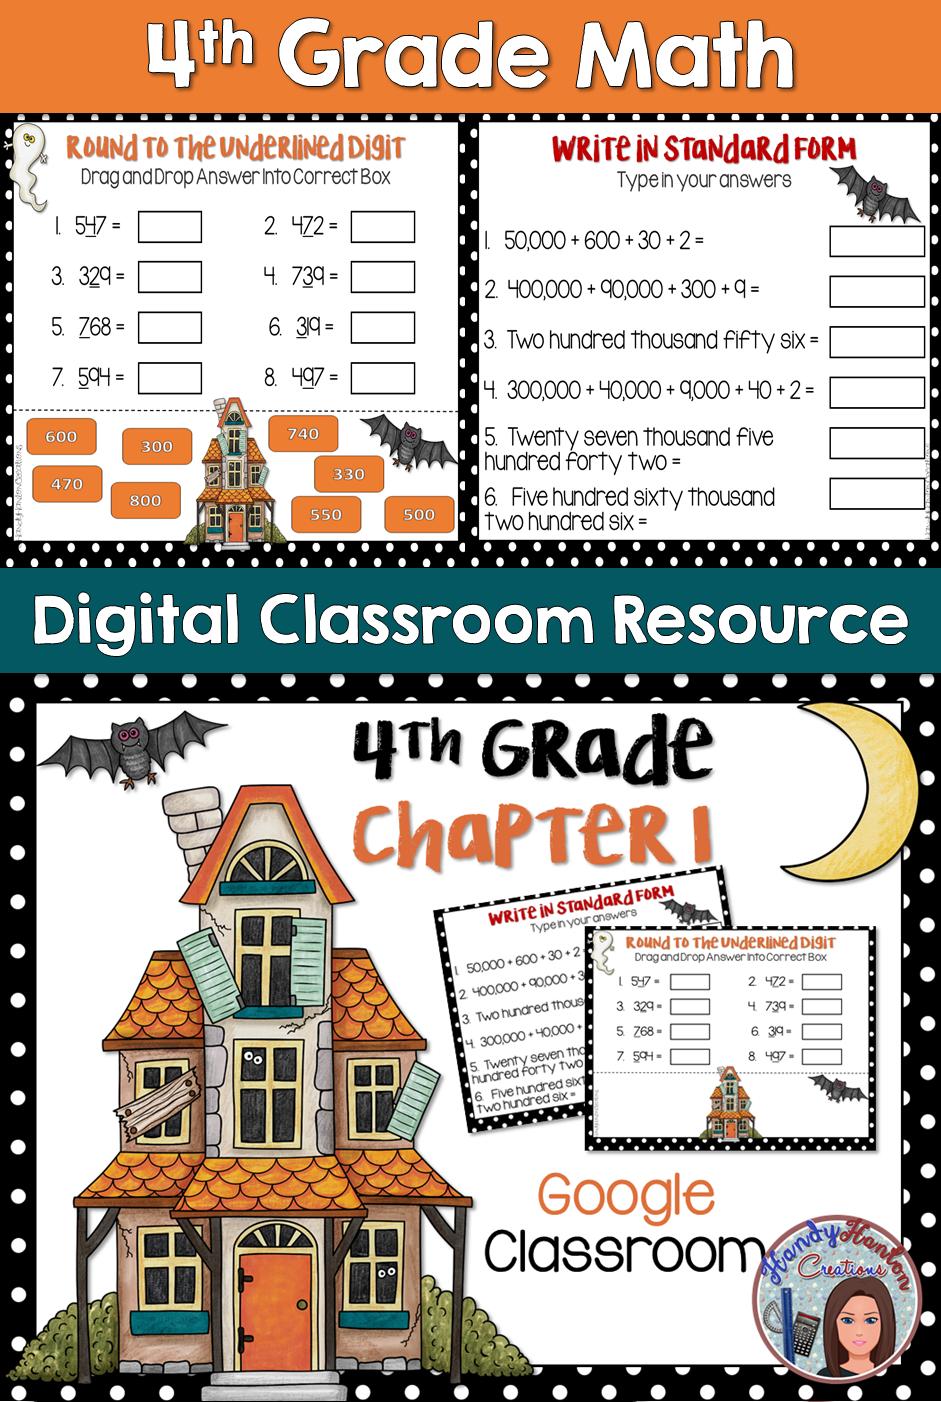 Halloween 4th Grade Math Chapter 1 Google Drive Resource